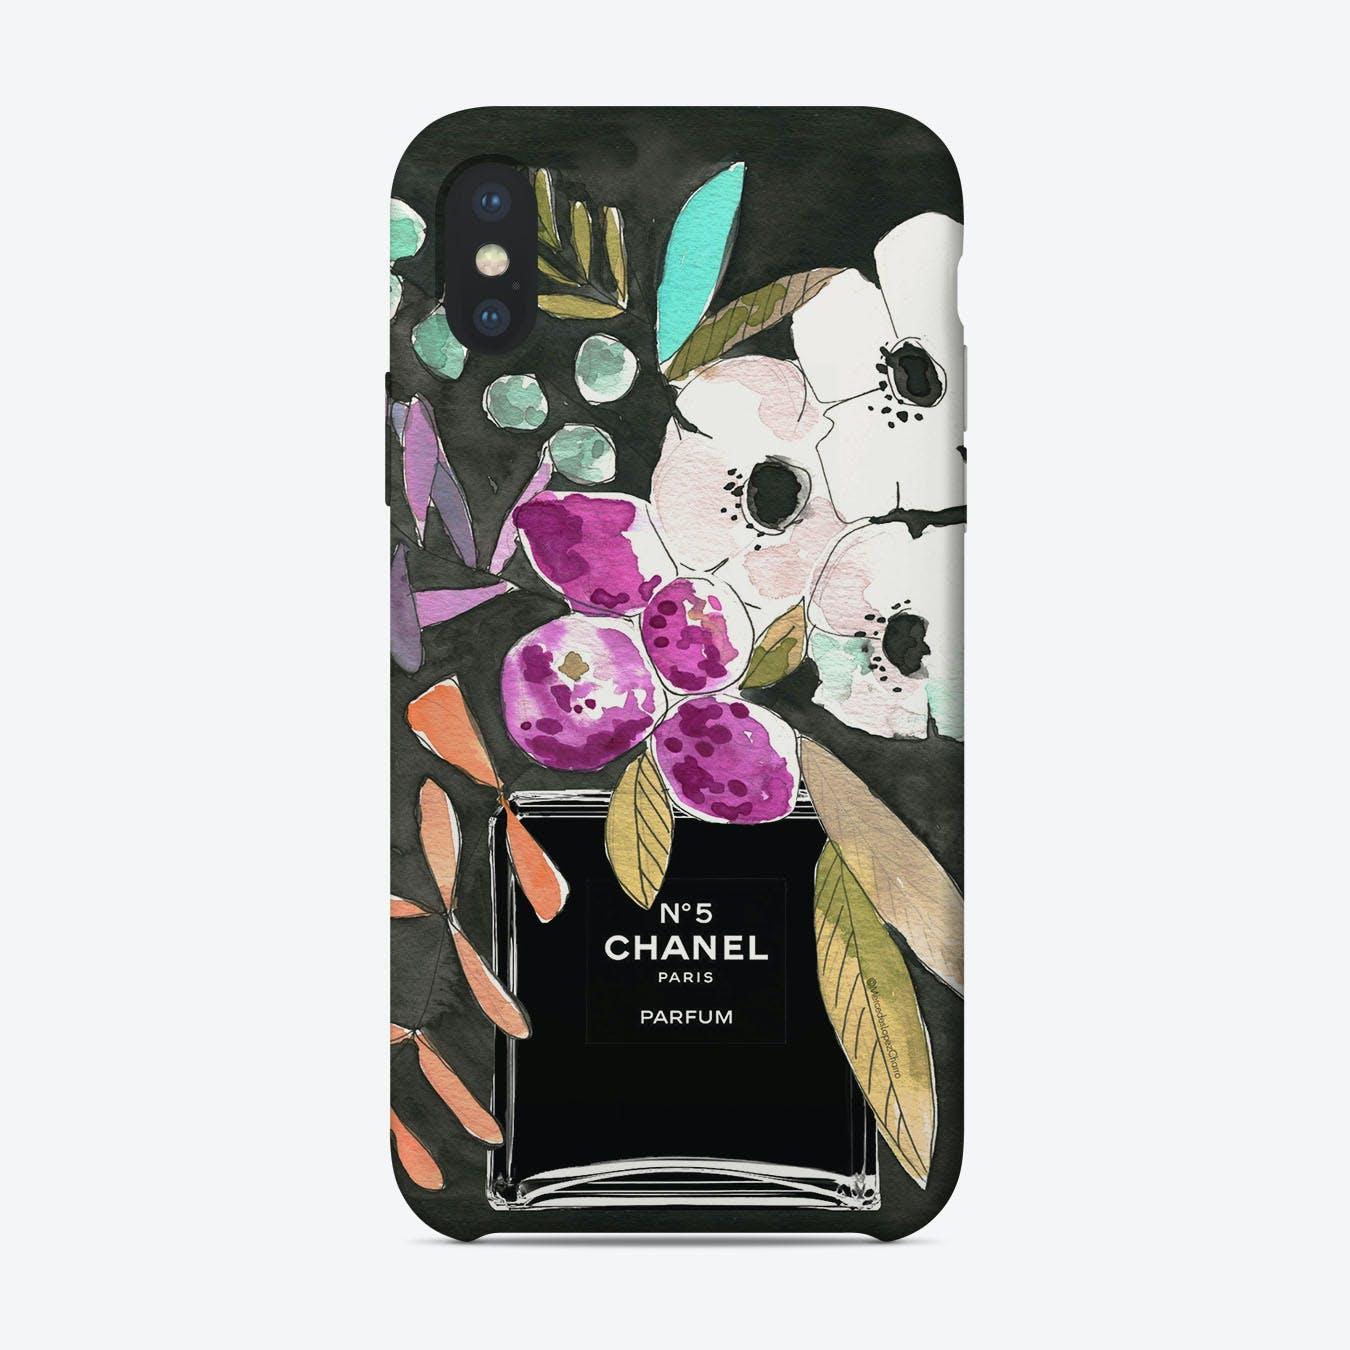 Chanel Midnight iPhone Case